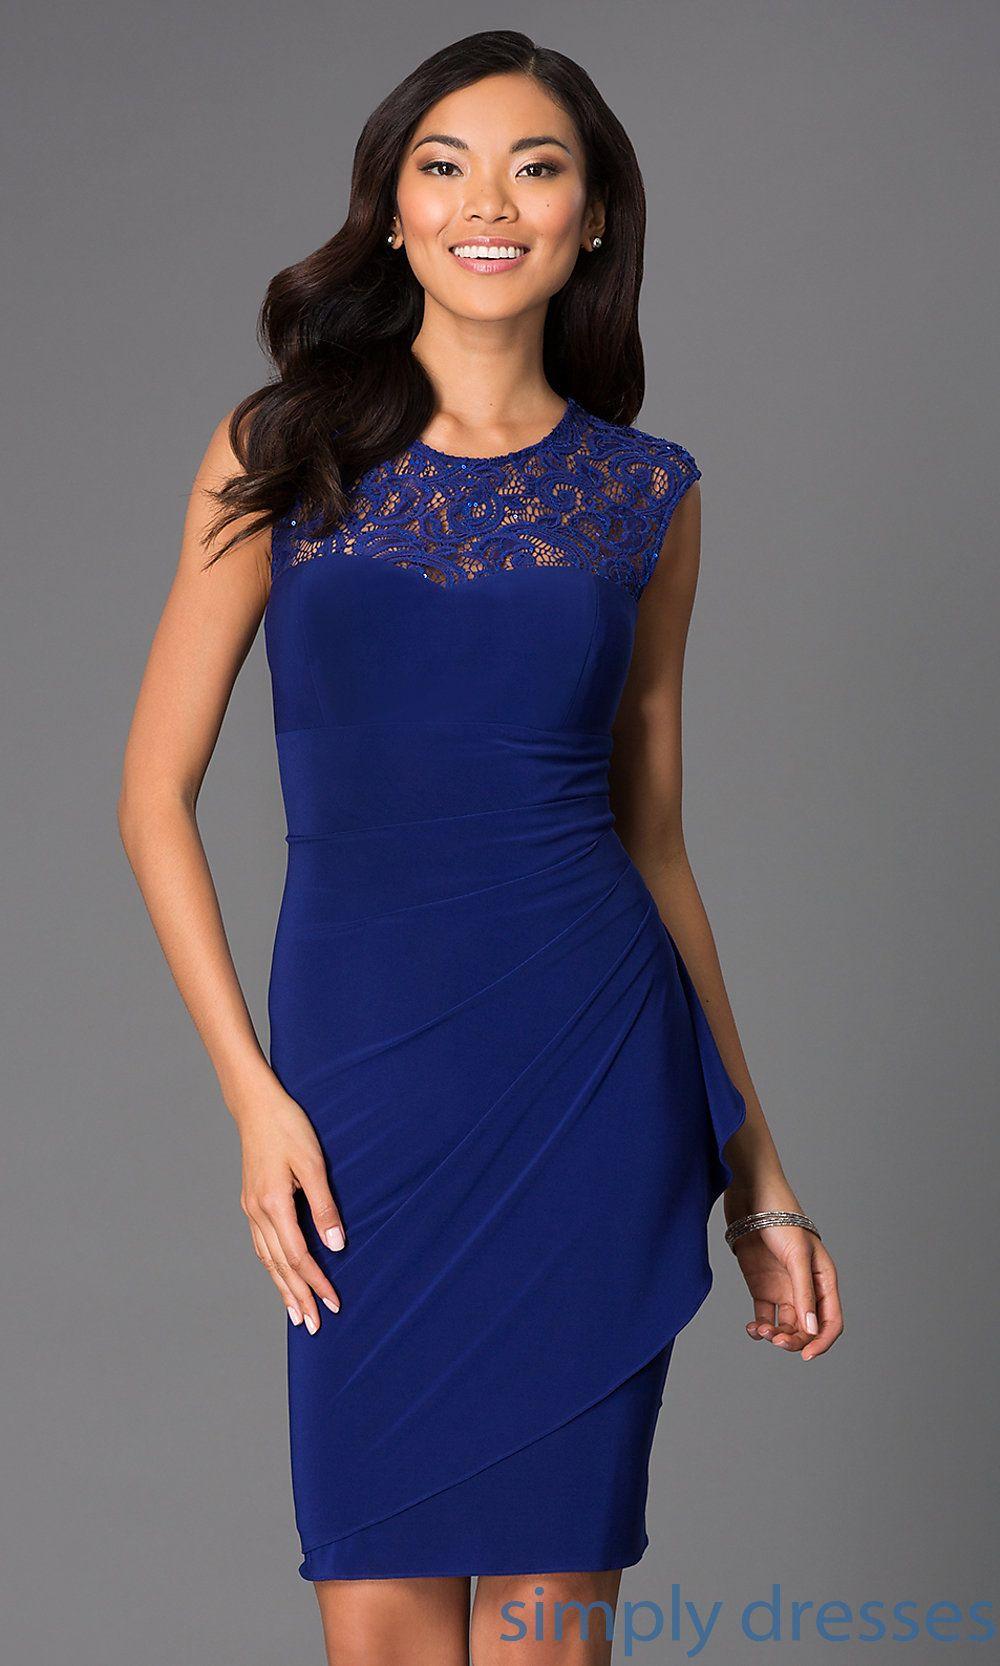 Homecoming Dresses, Formal Prom Dresses, Evening Wear: Sleeveless ...